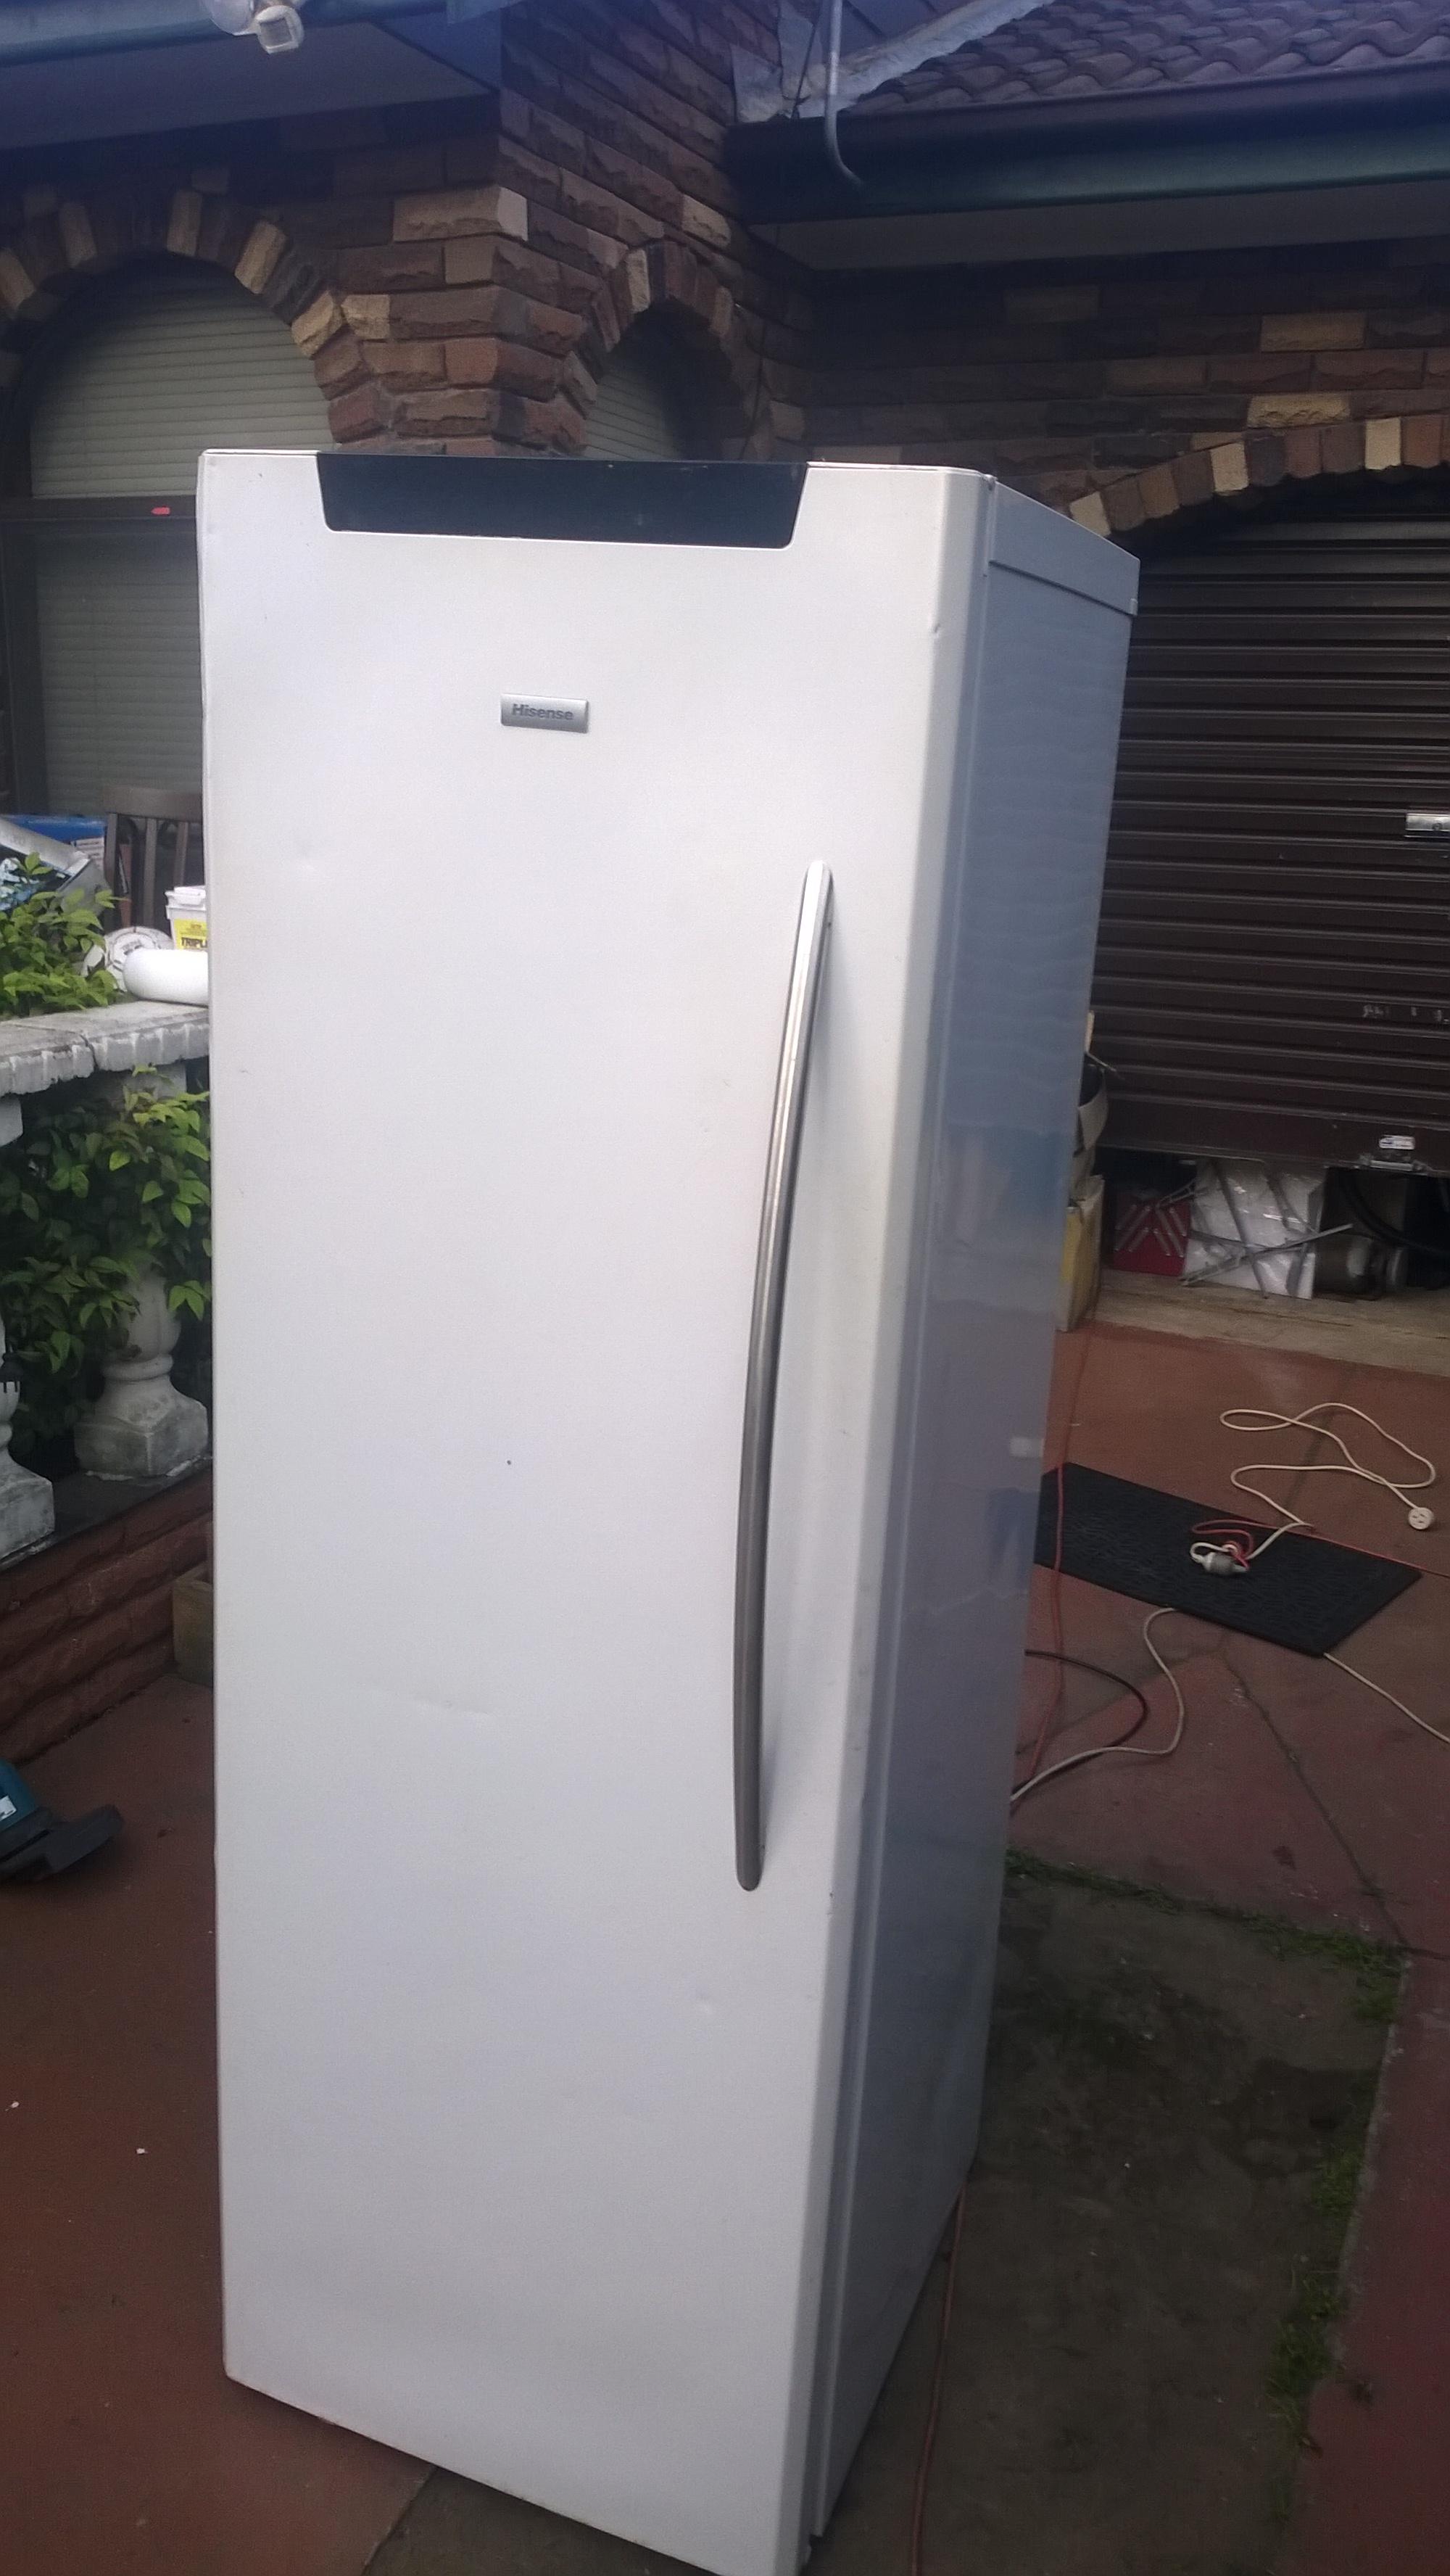 Hisense Freezer Model: HR6VFF255